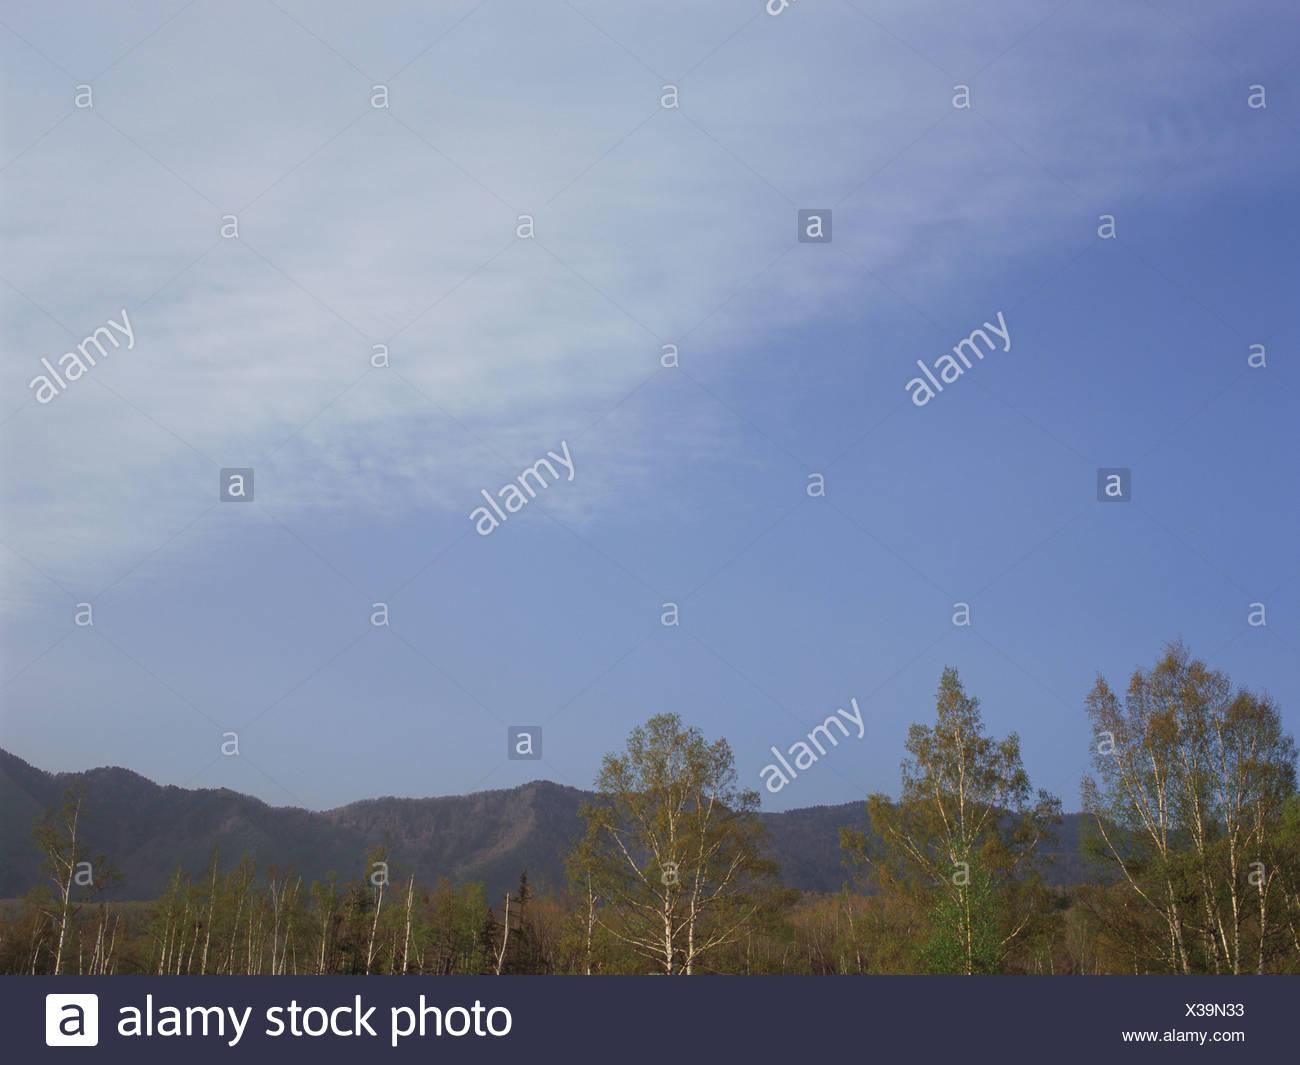 Silver birch forest, Norikura, Nagano Prefecture, Japan - Stock Image